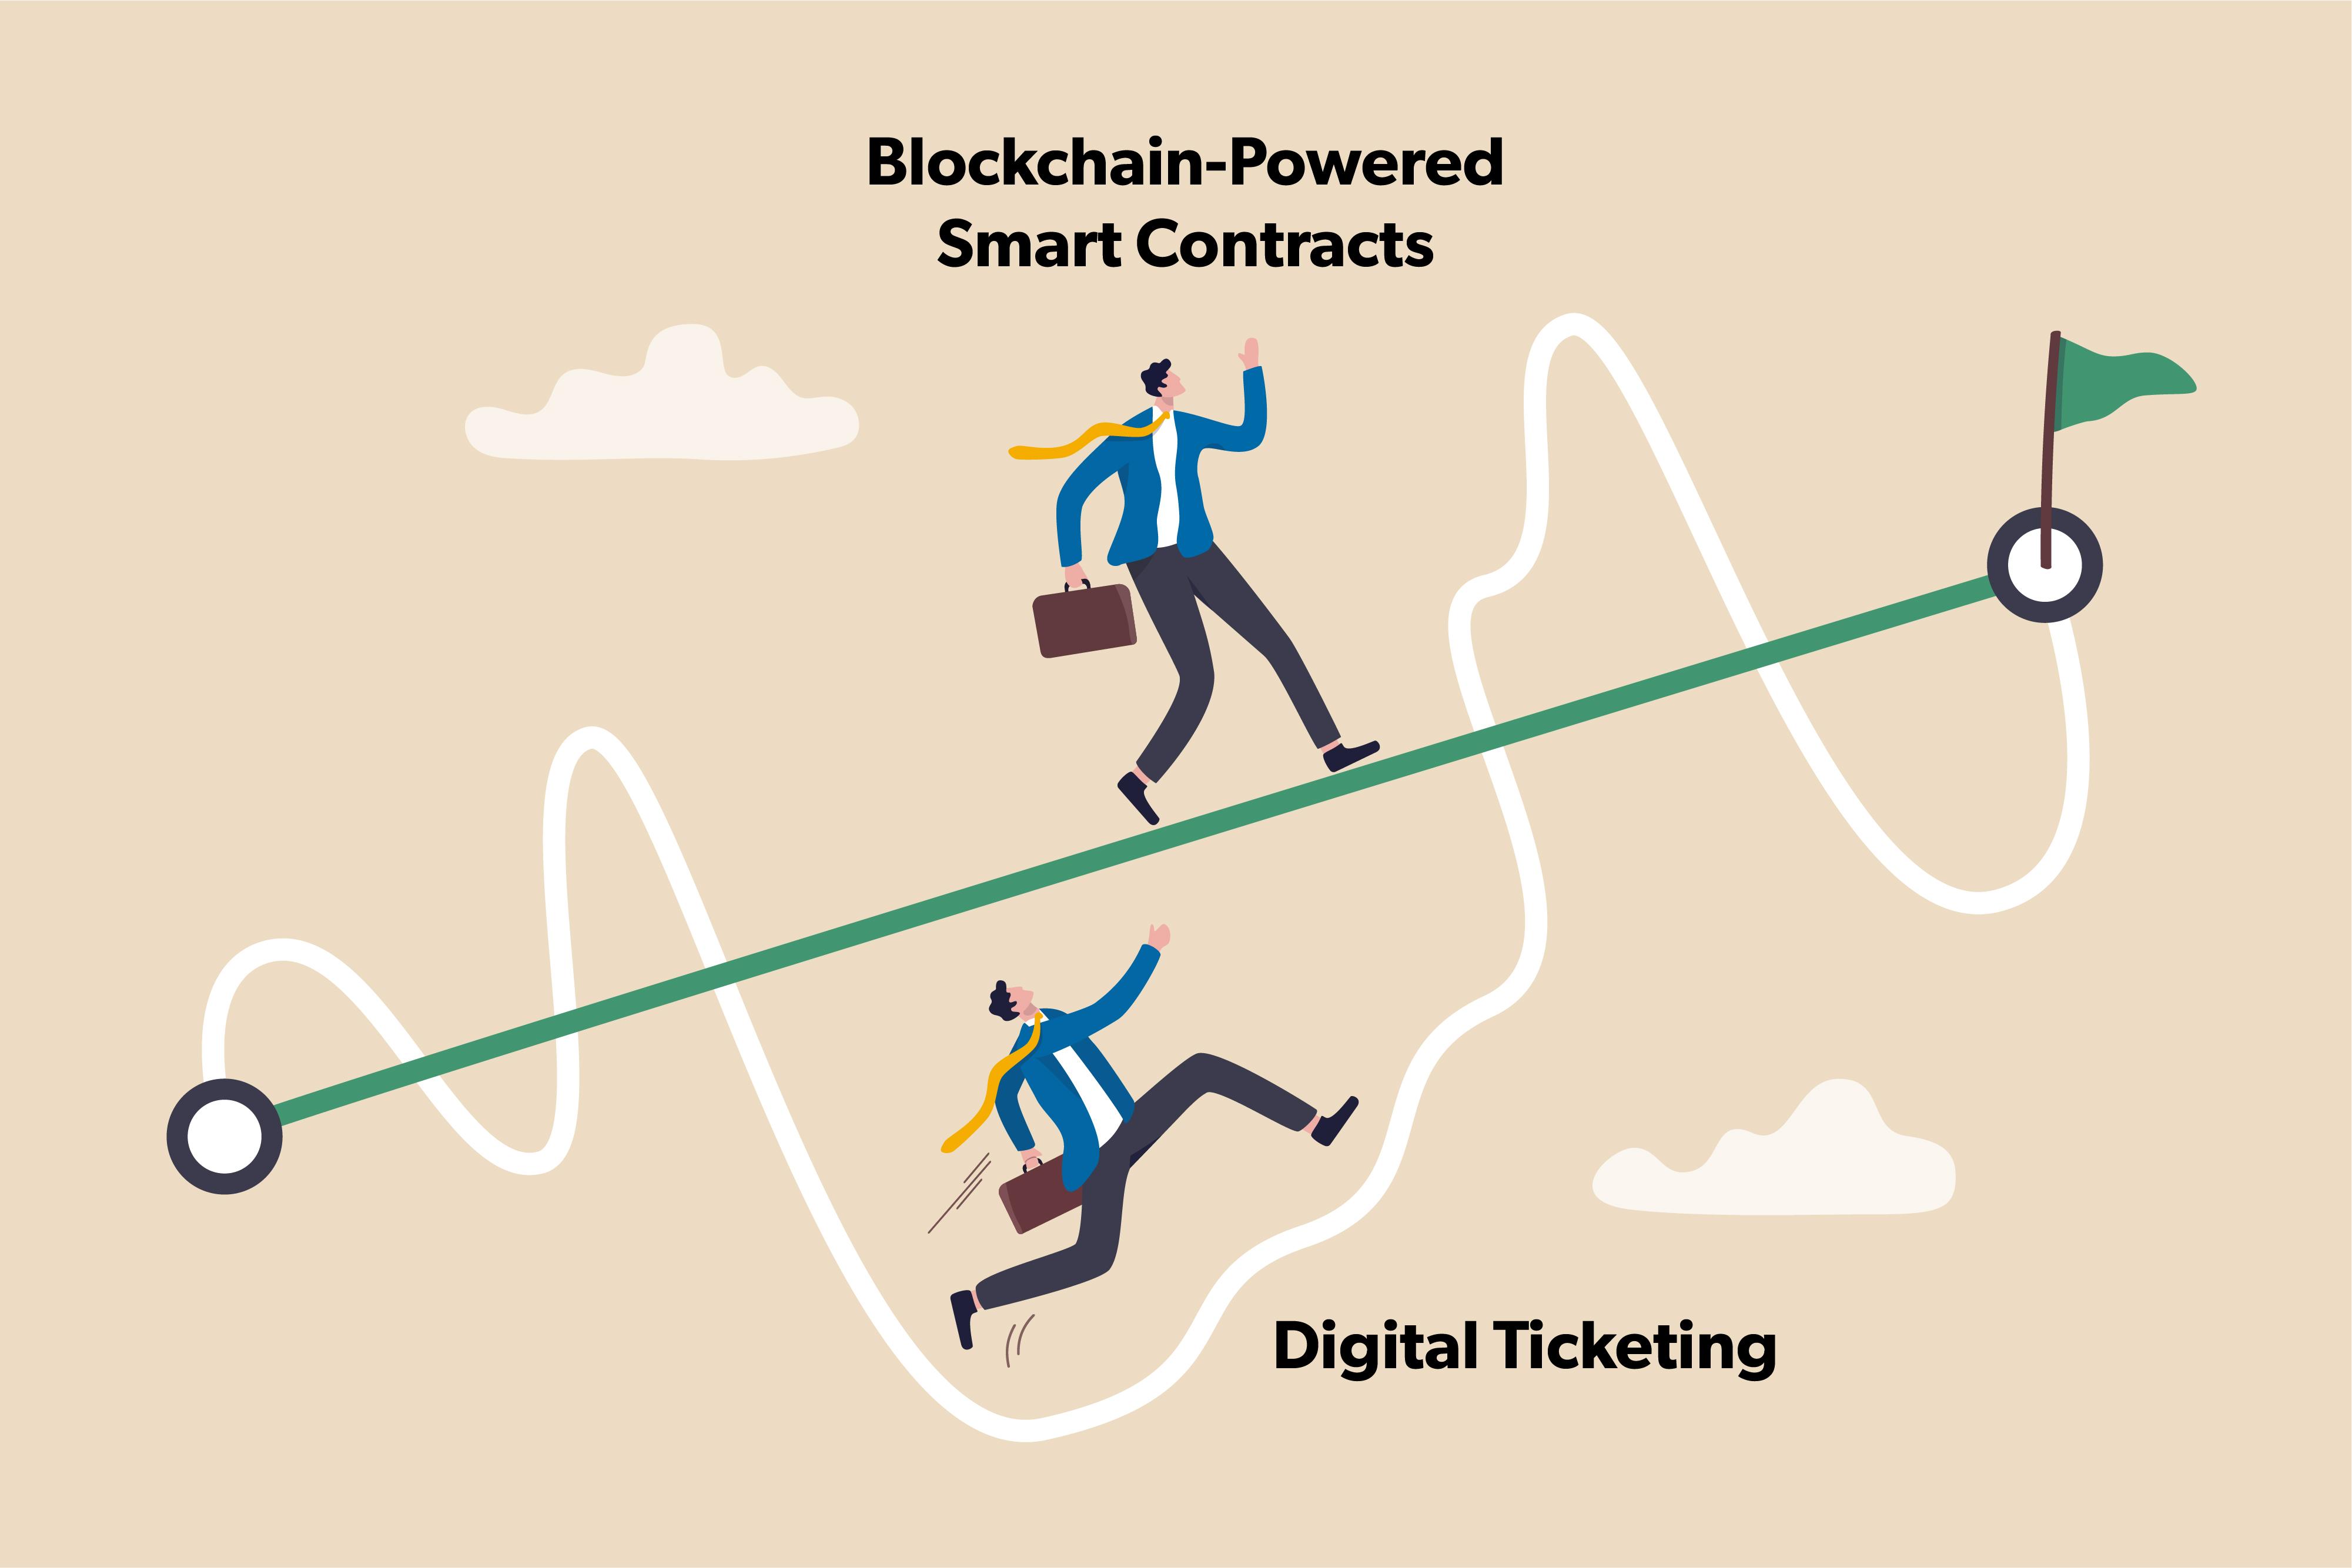 Blockchain-Powered Smart Contracts Vs. Digital Ticketing